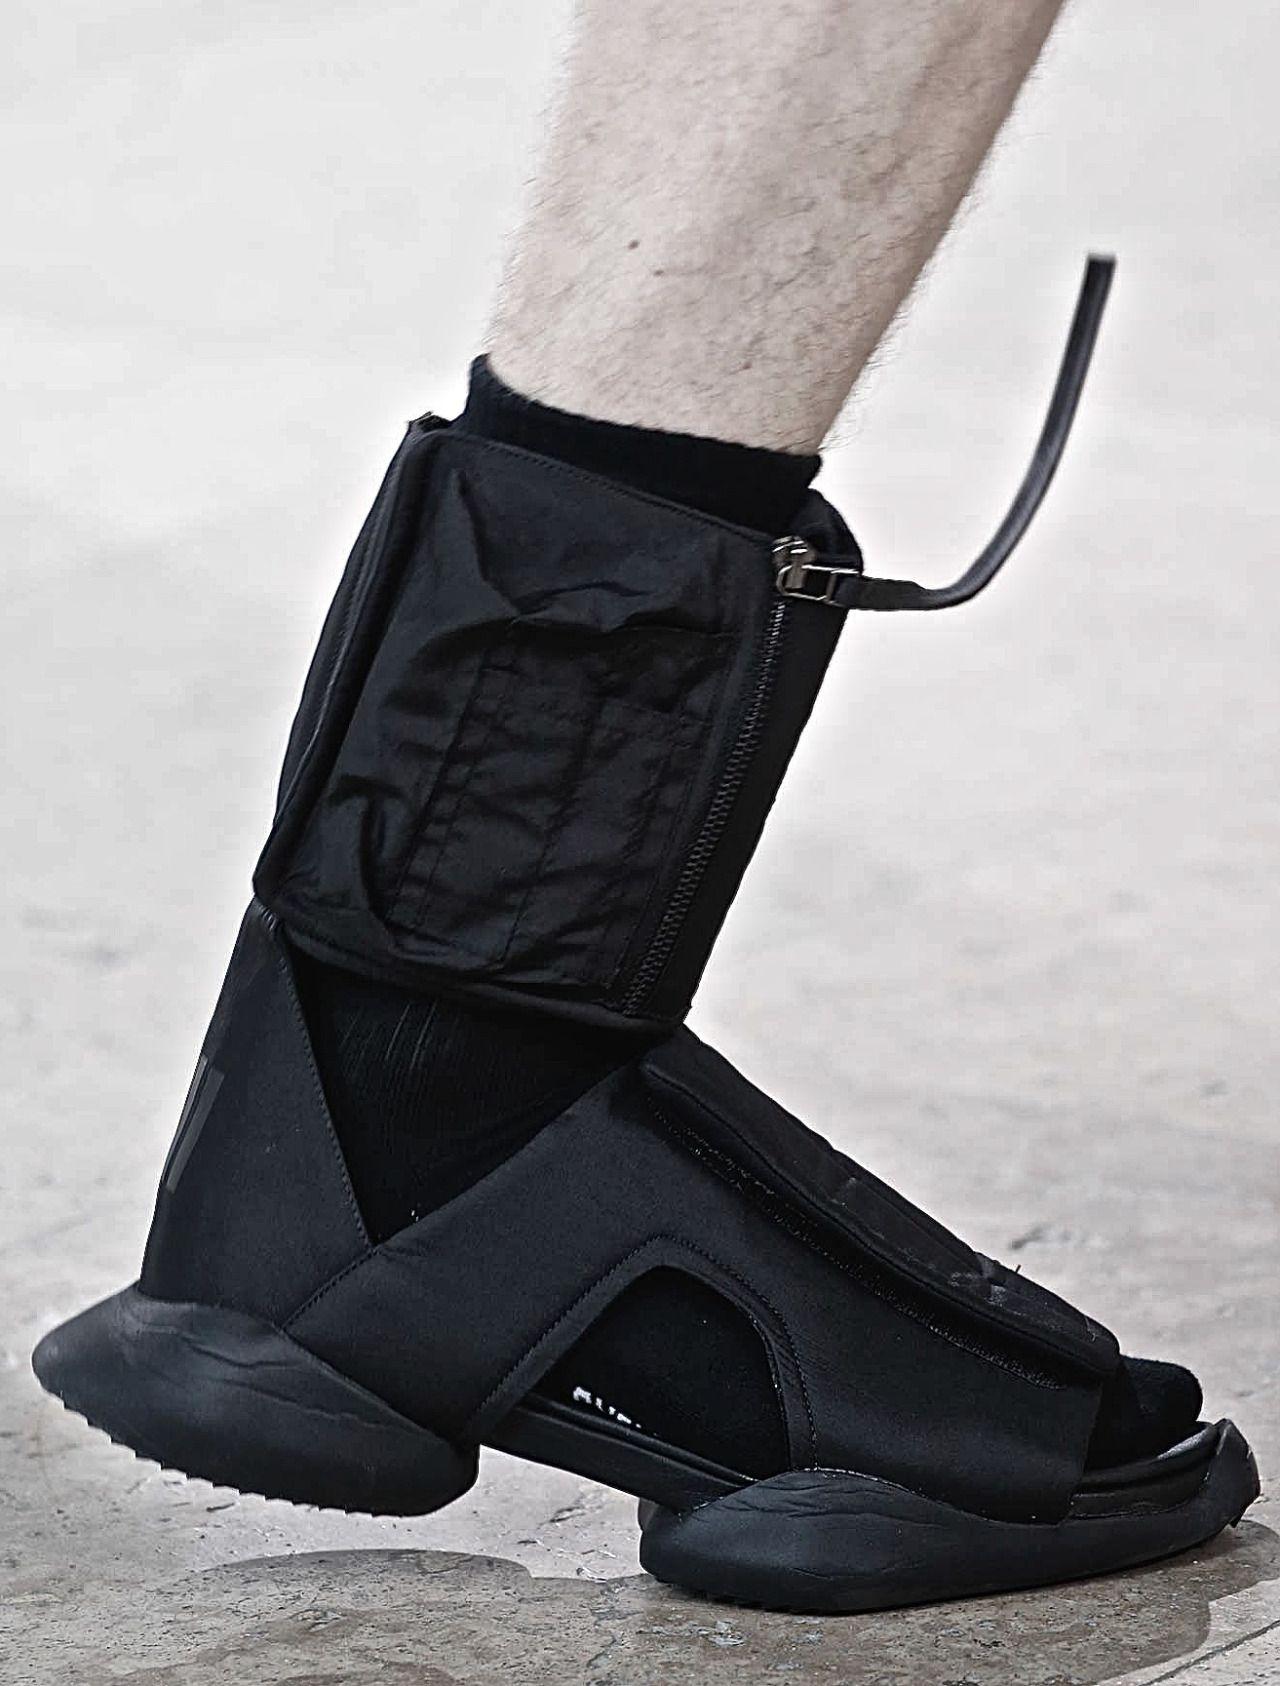 Leather CYCLOPS BIKER Boots Fall/winterRick Owens 3QcZIj